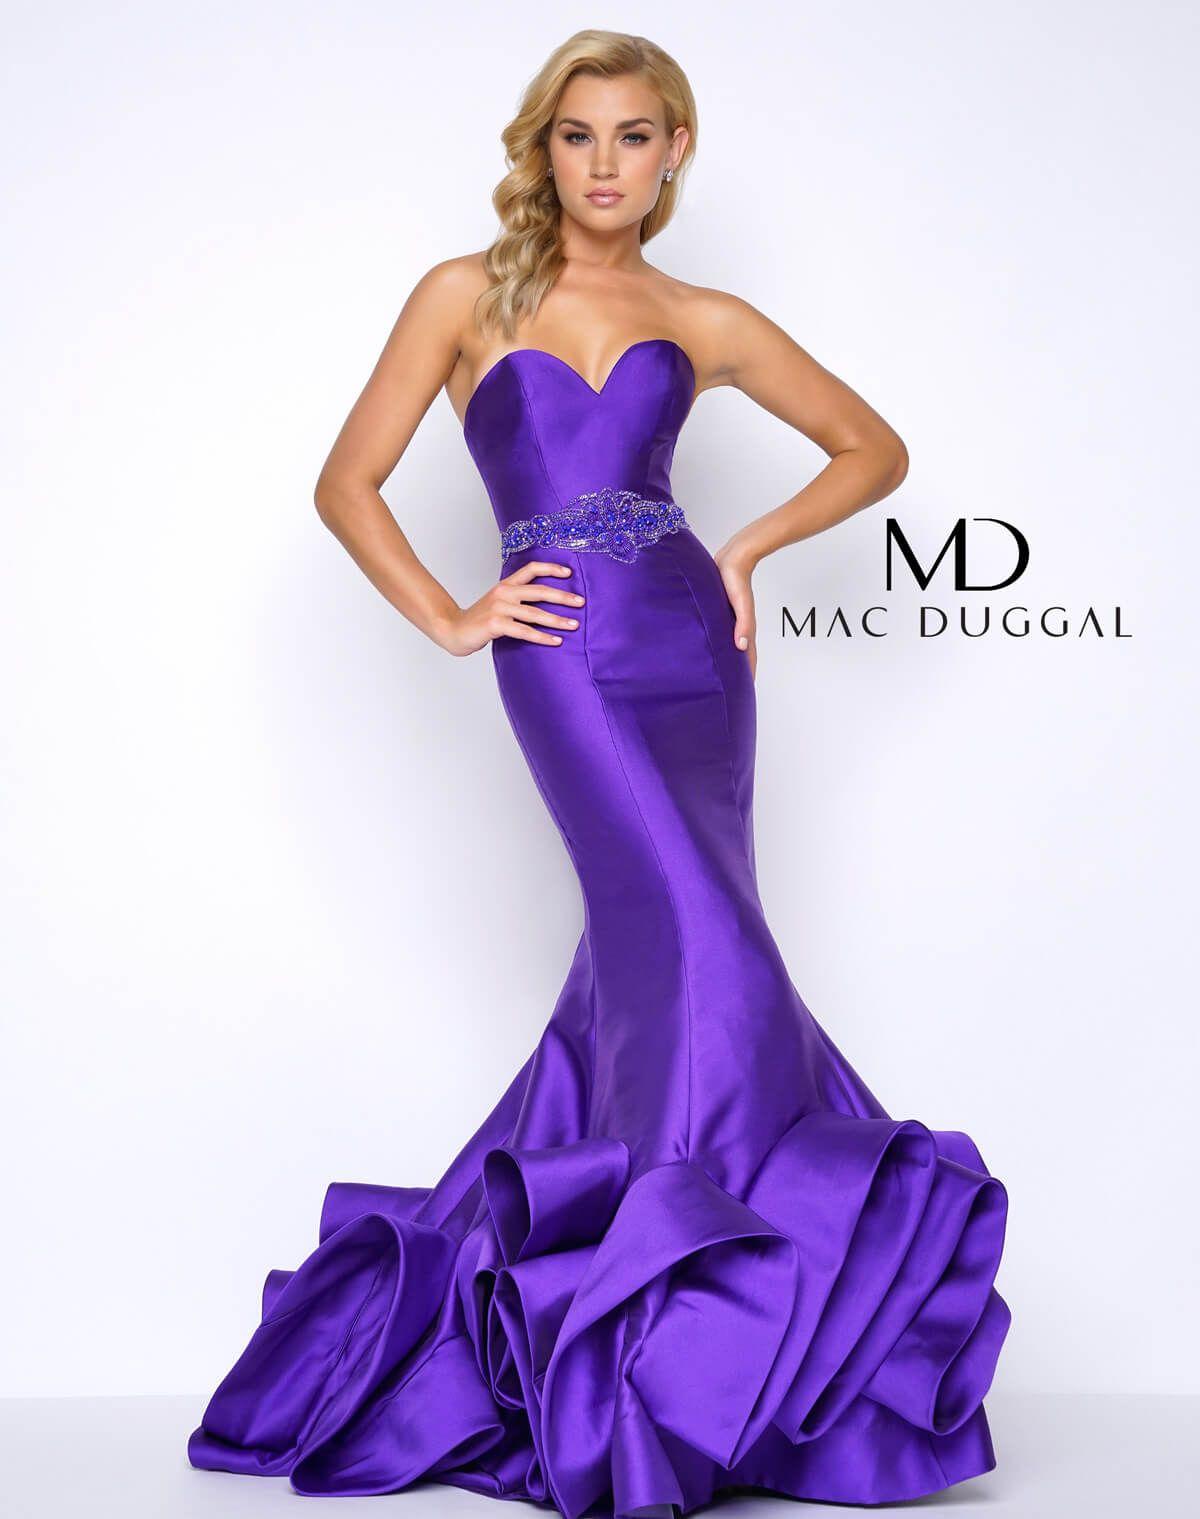 62711m Mac Duggal Strapless Dress Formal Gowns Dresses Dresses [ 1519 x 1200 Pixel ]